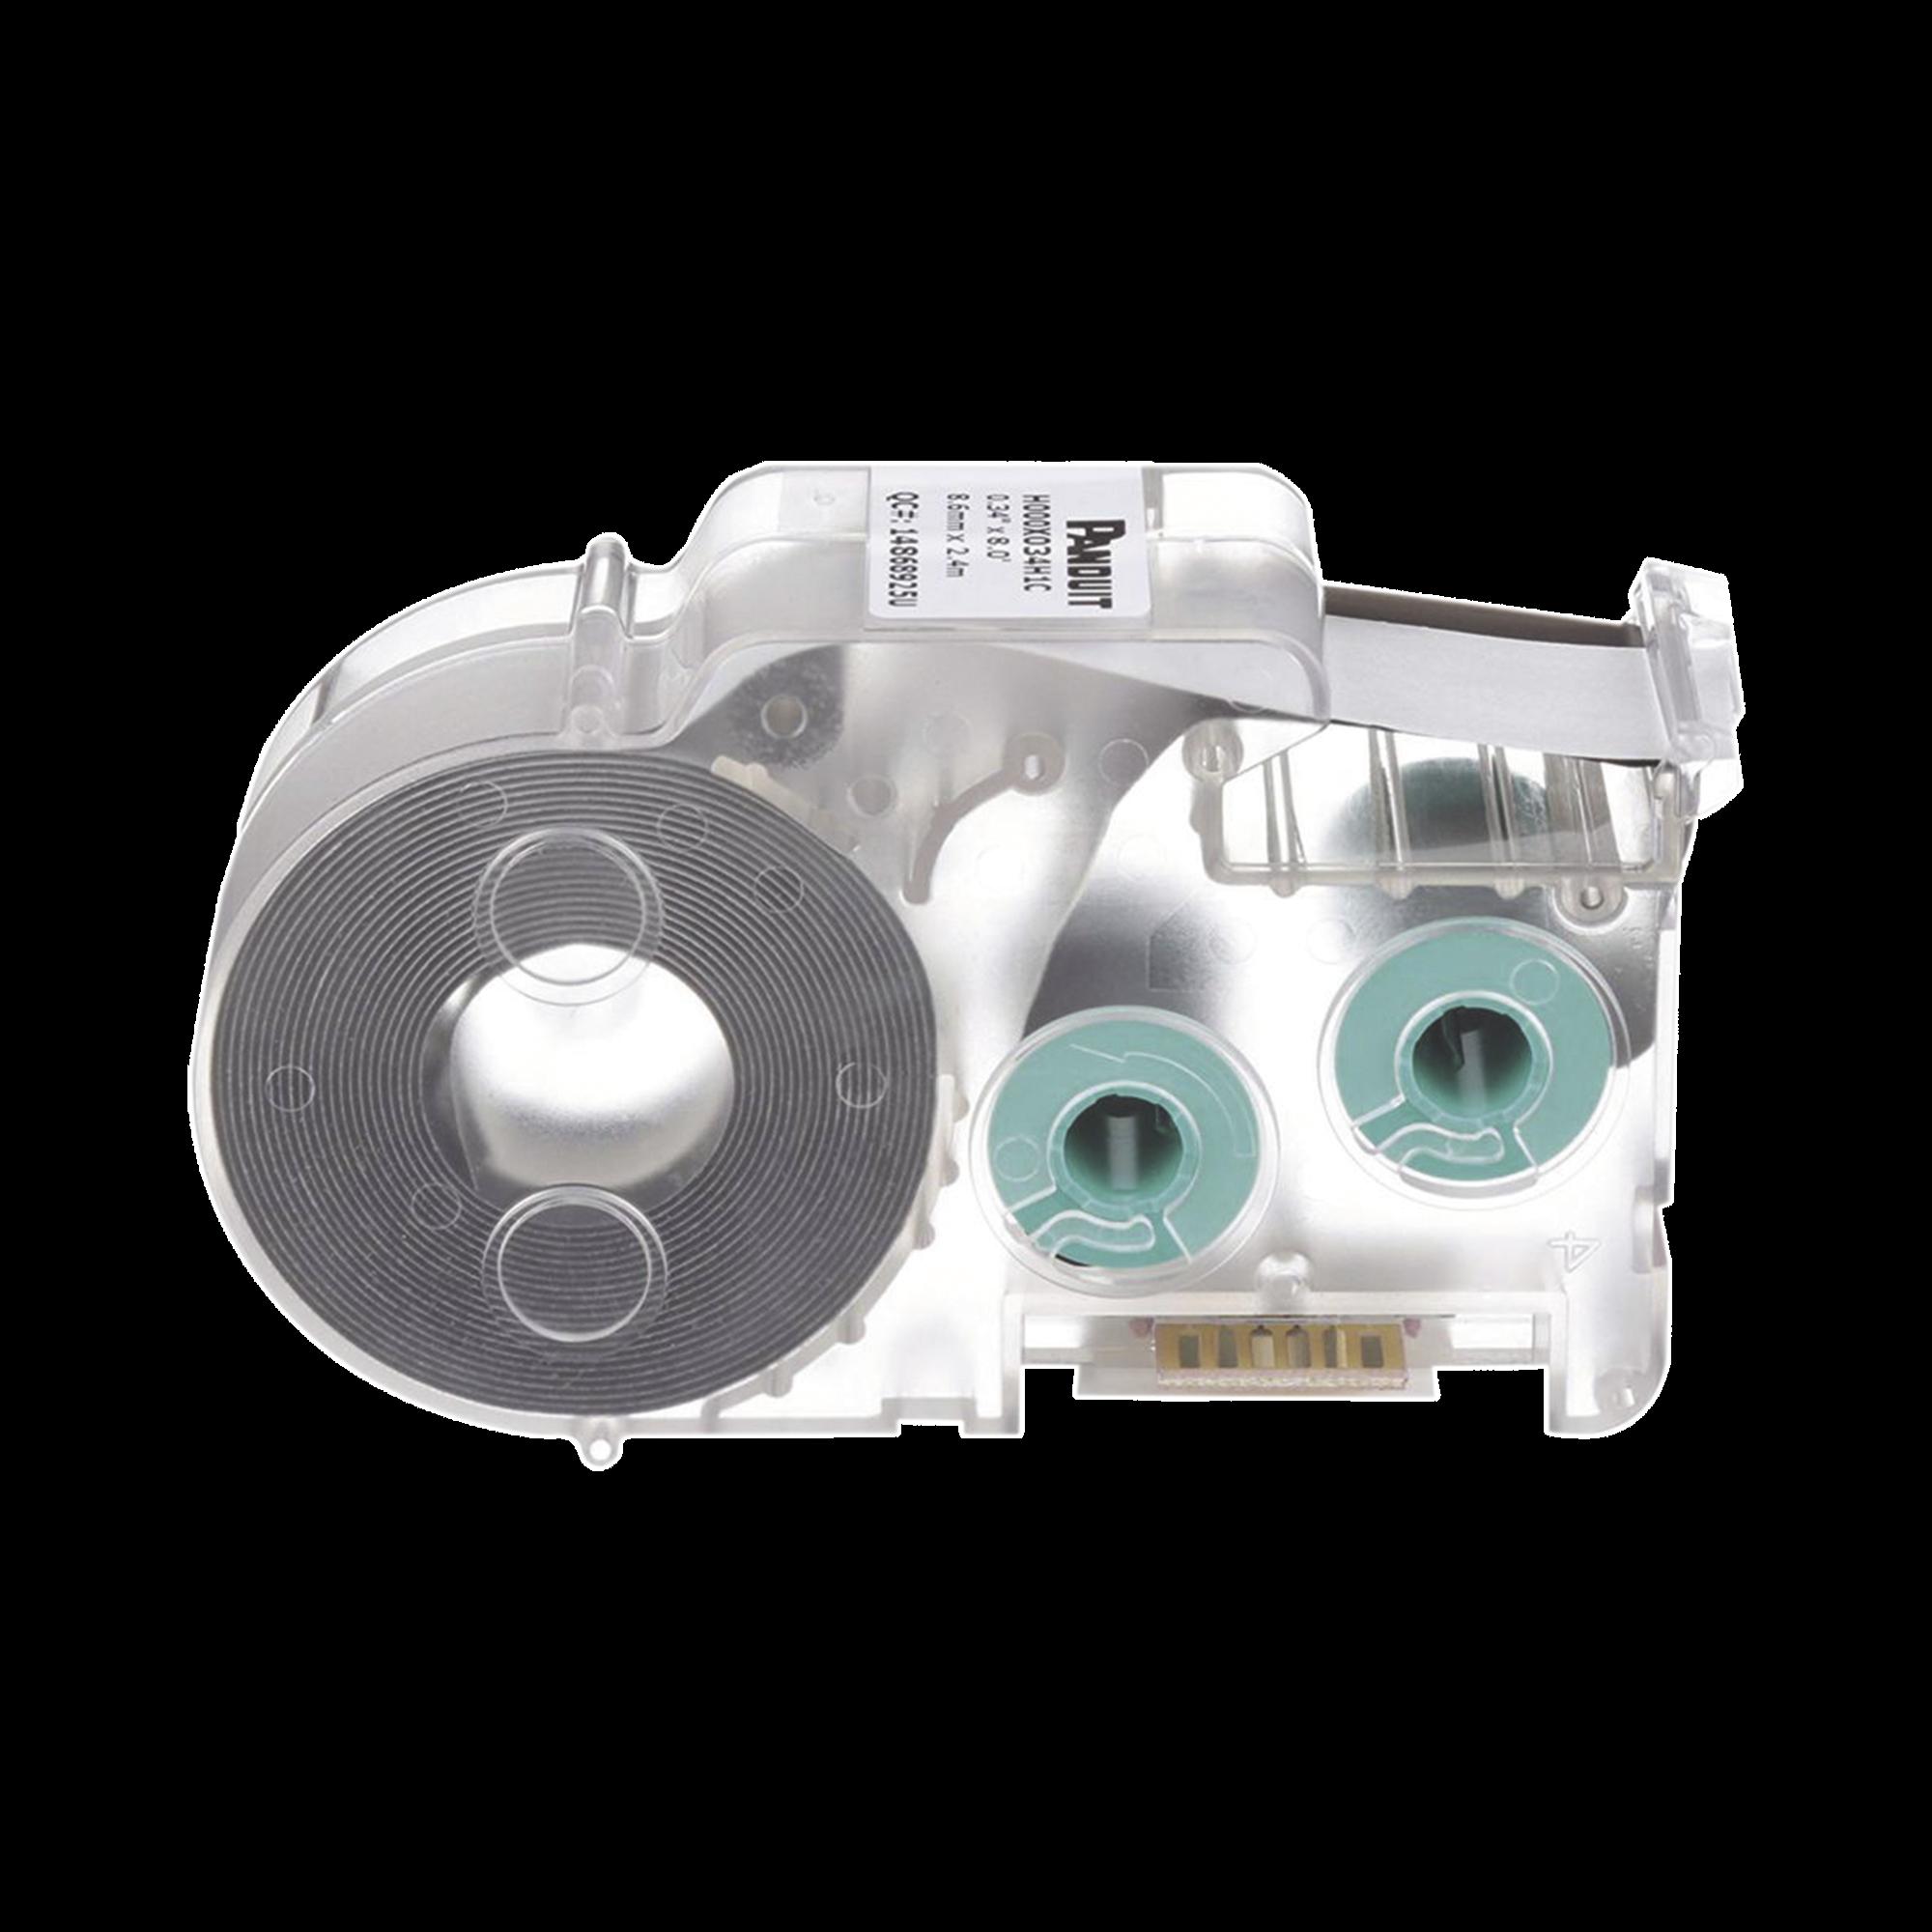 Casete de 225 Etiquetas Autolaminadas de 12.7 x 31.8 mm, para Cables de 3 a 7.1 mm de Diámetro, área de Impresión Color Blanco